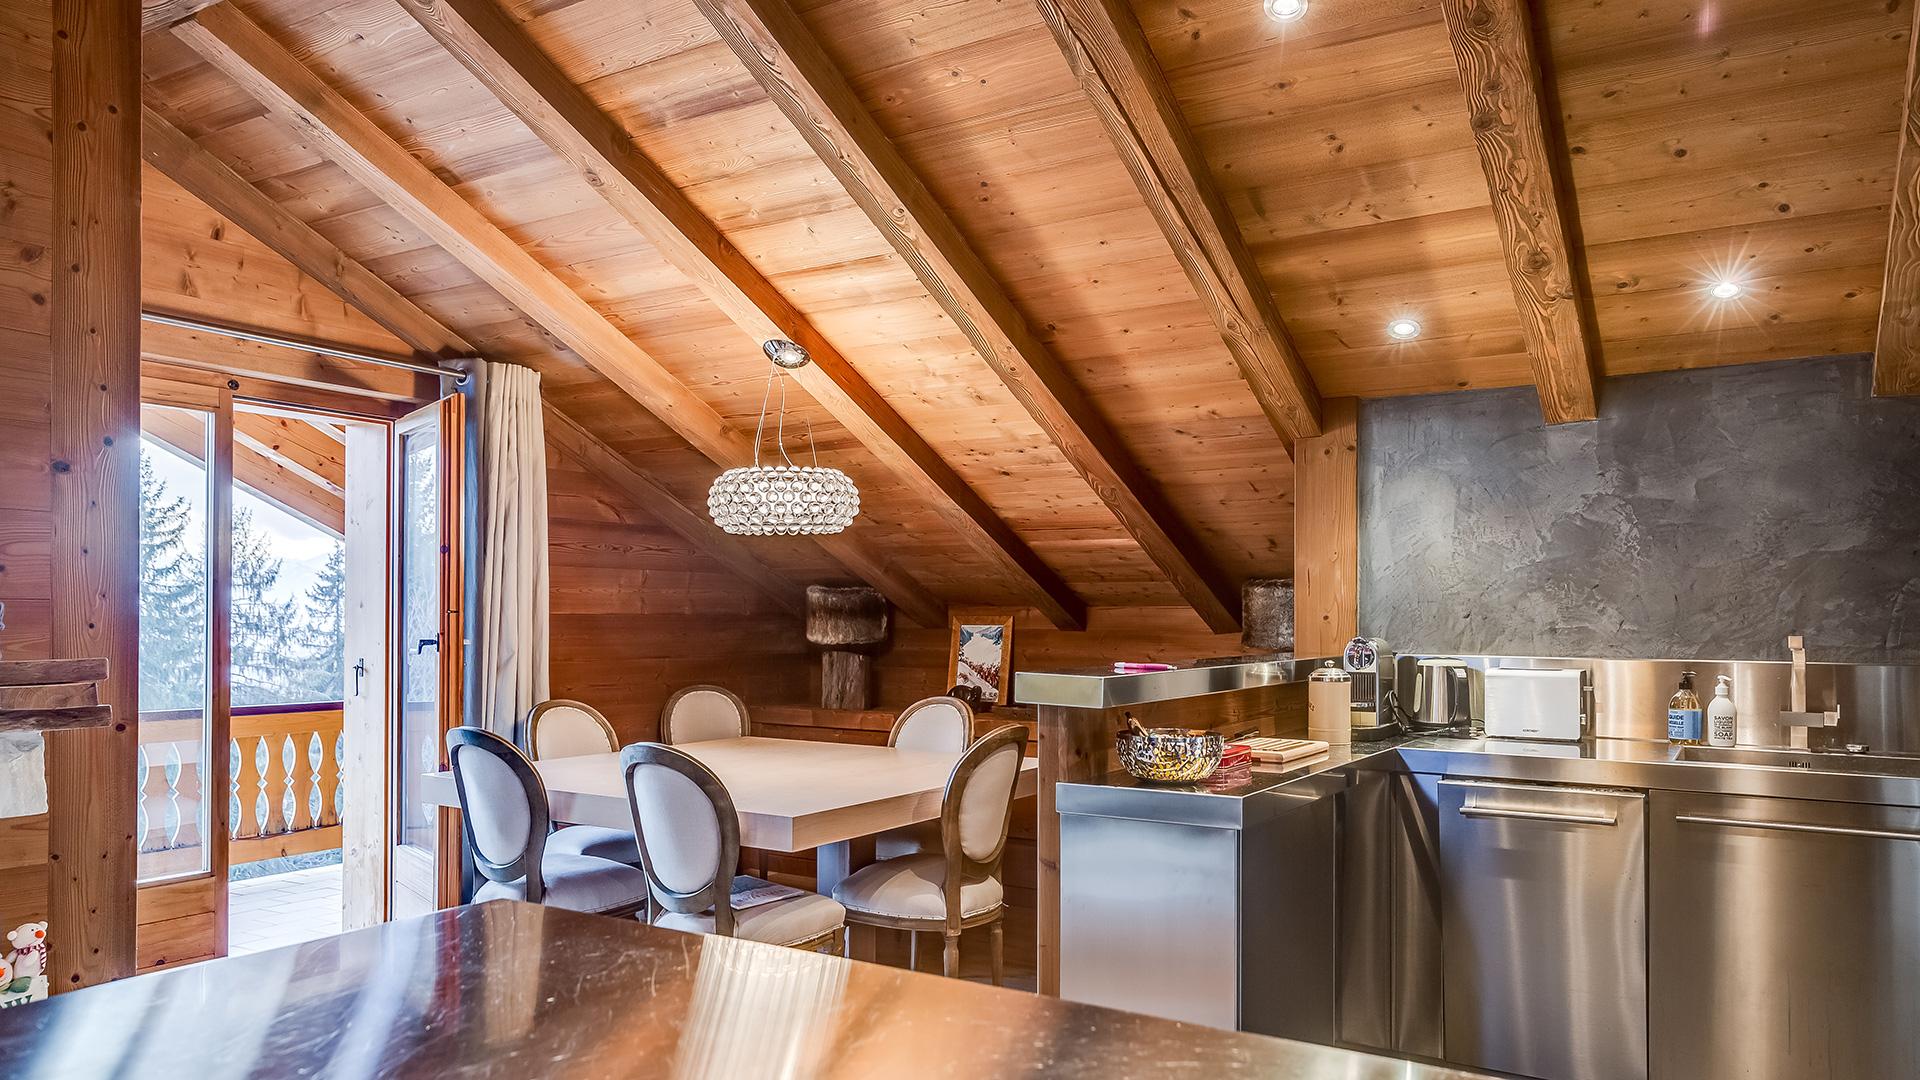 Myrtes 8 Apartments, Switzerland